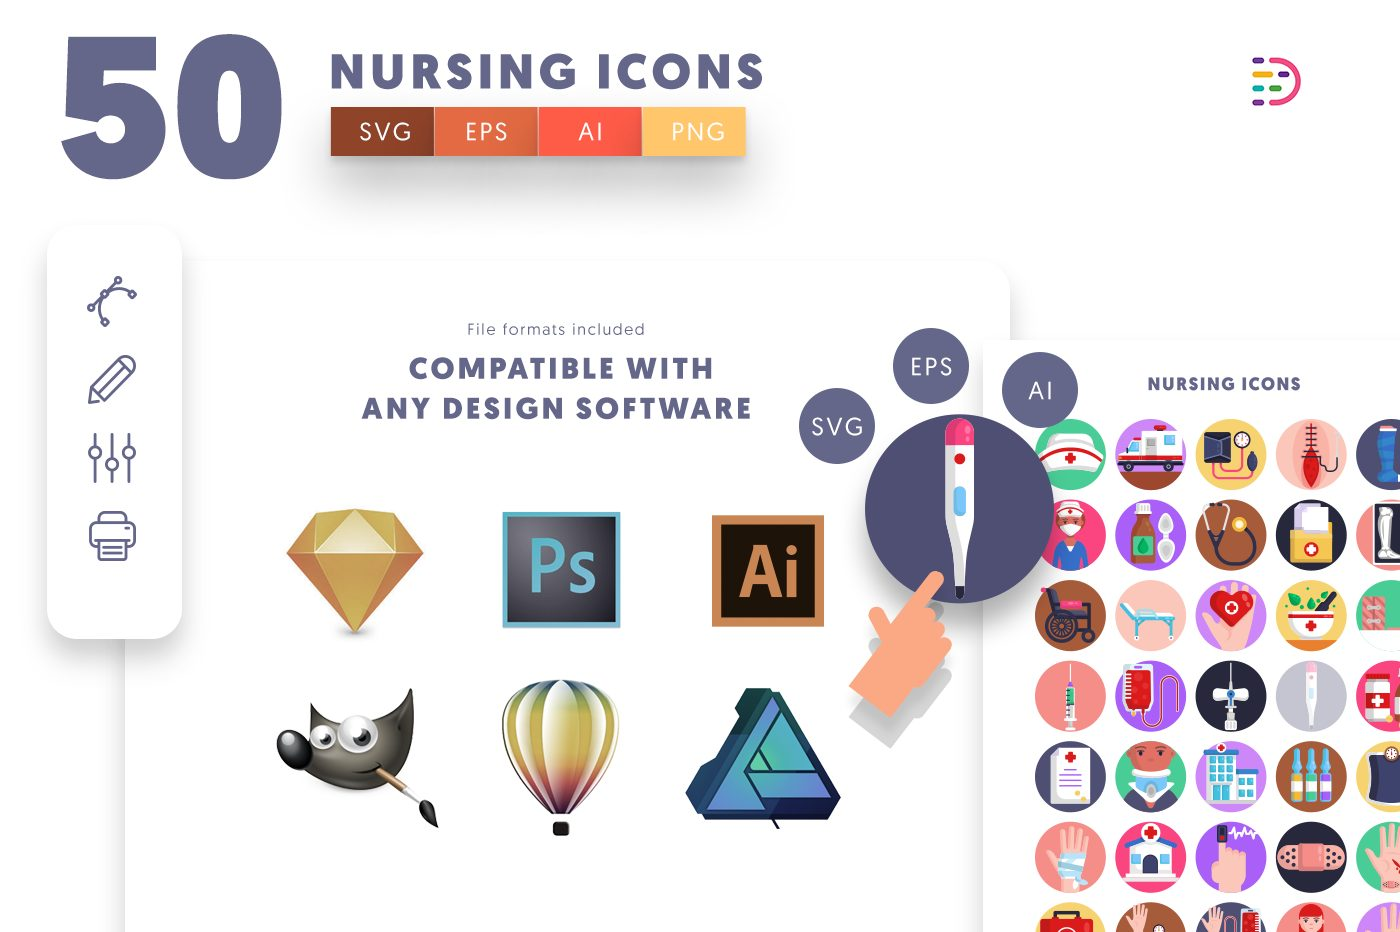 full vector 50 Nursing Icons EPS, SVG, PNG